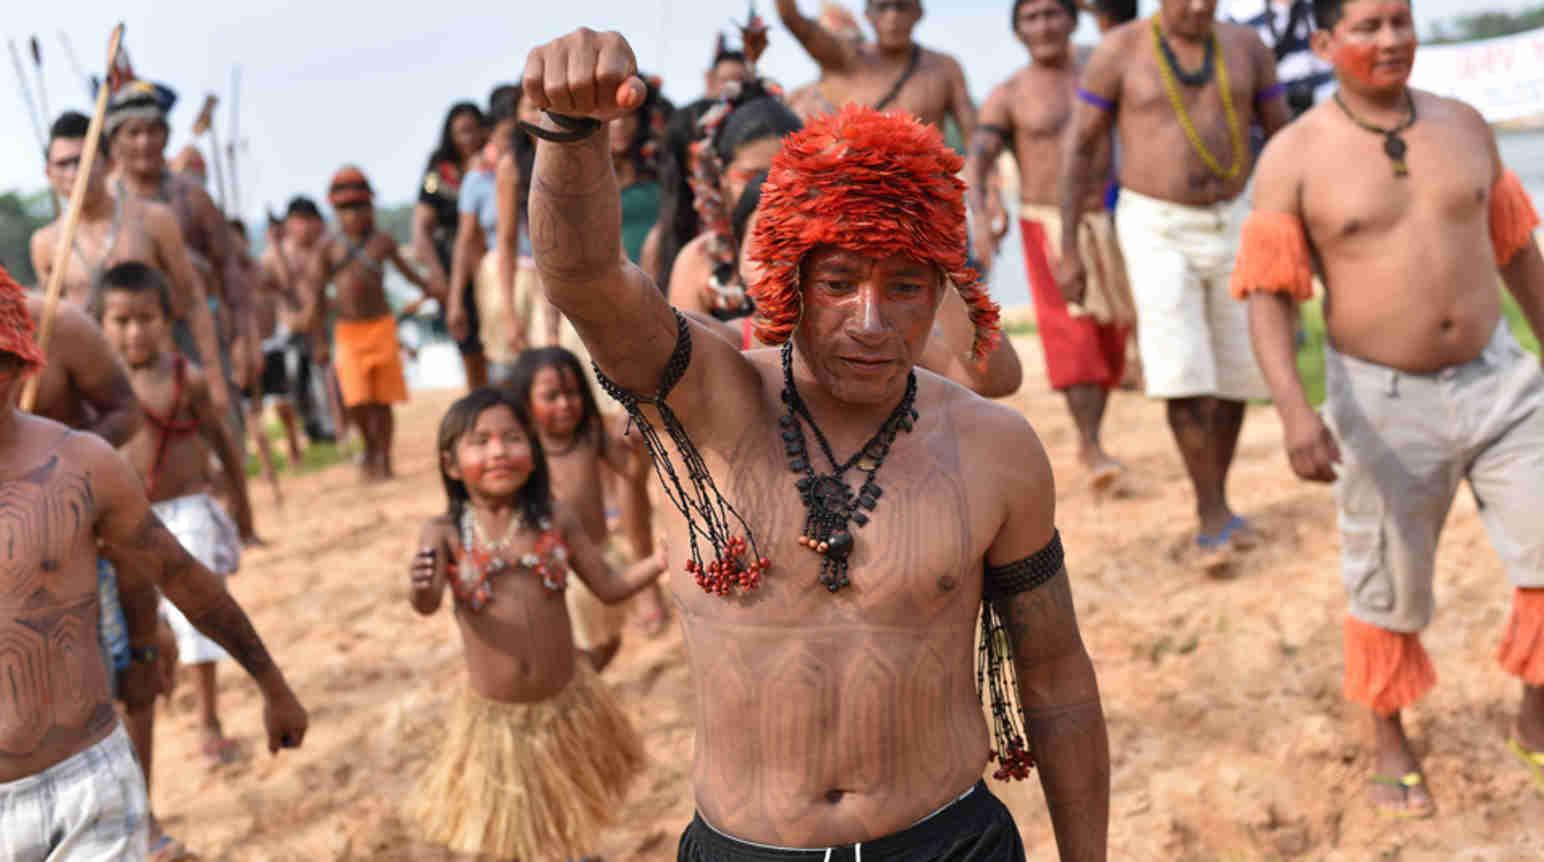 Indien amazoni porno nsfw gallery